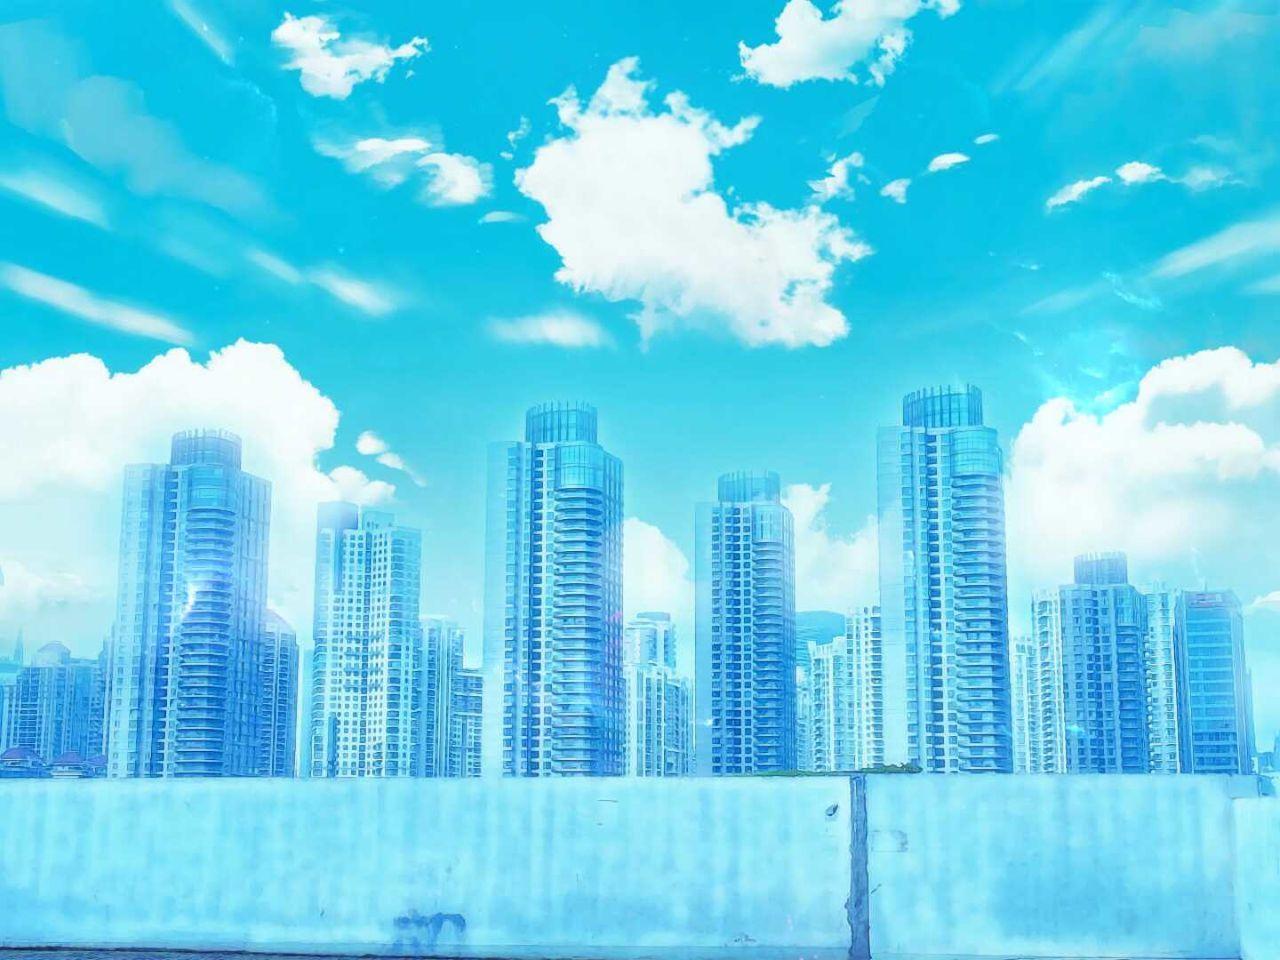 Skyscraper City Business Finance And Industry Urban Skyline Architecture Cloud - Sky Cityscape Sky Anime Animelover Manga Backgrounds